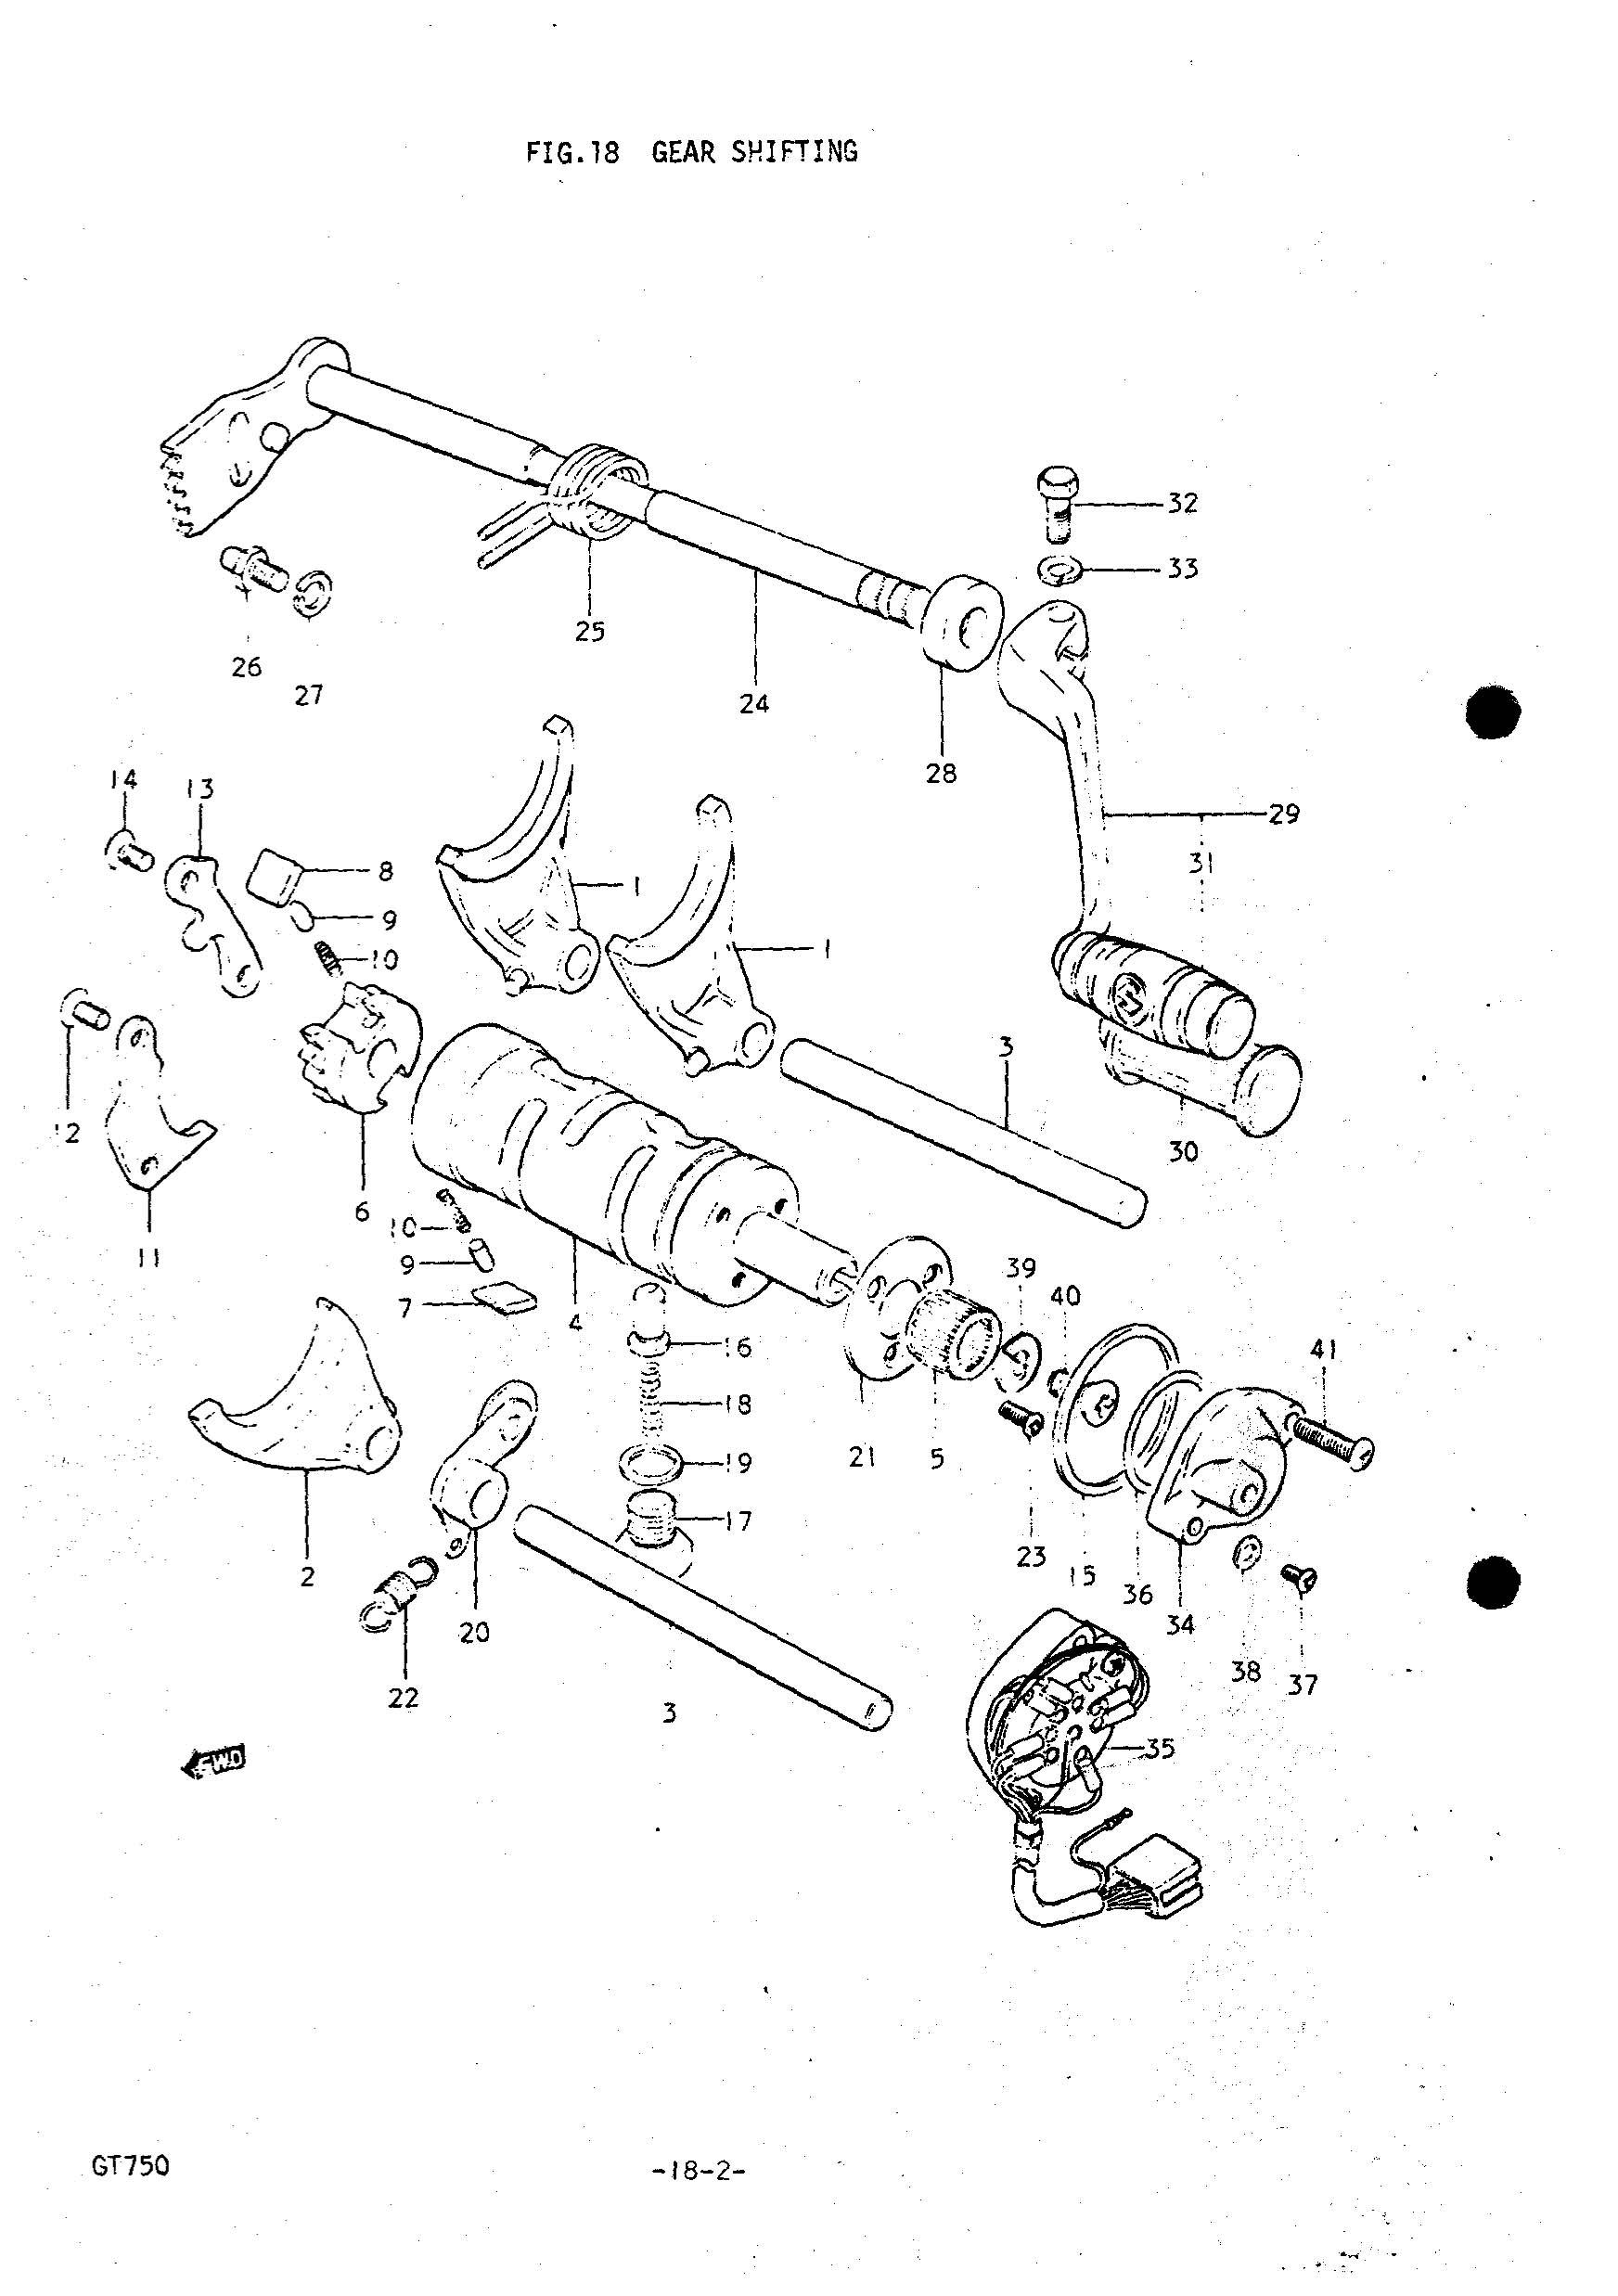 Suzuki Ozark Shifter Diagram